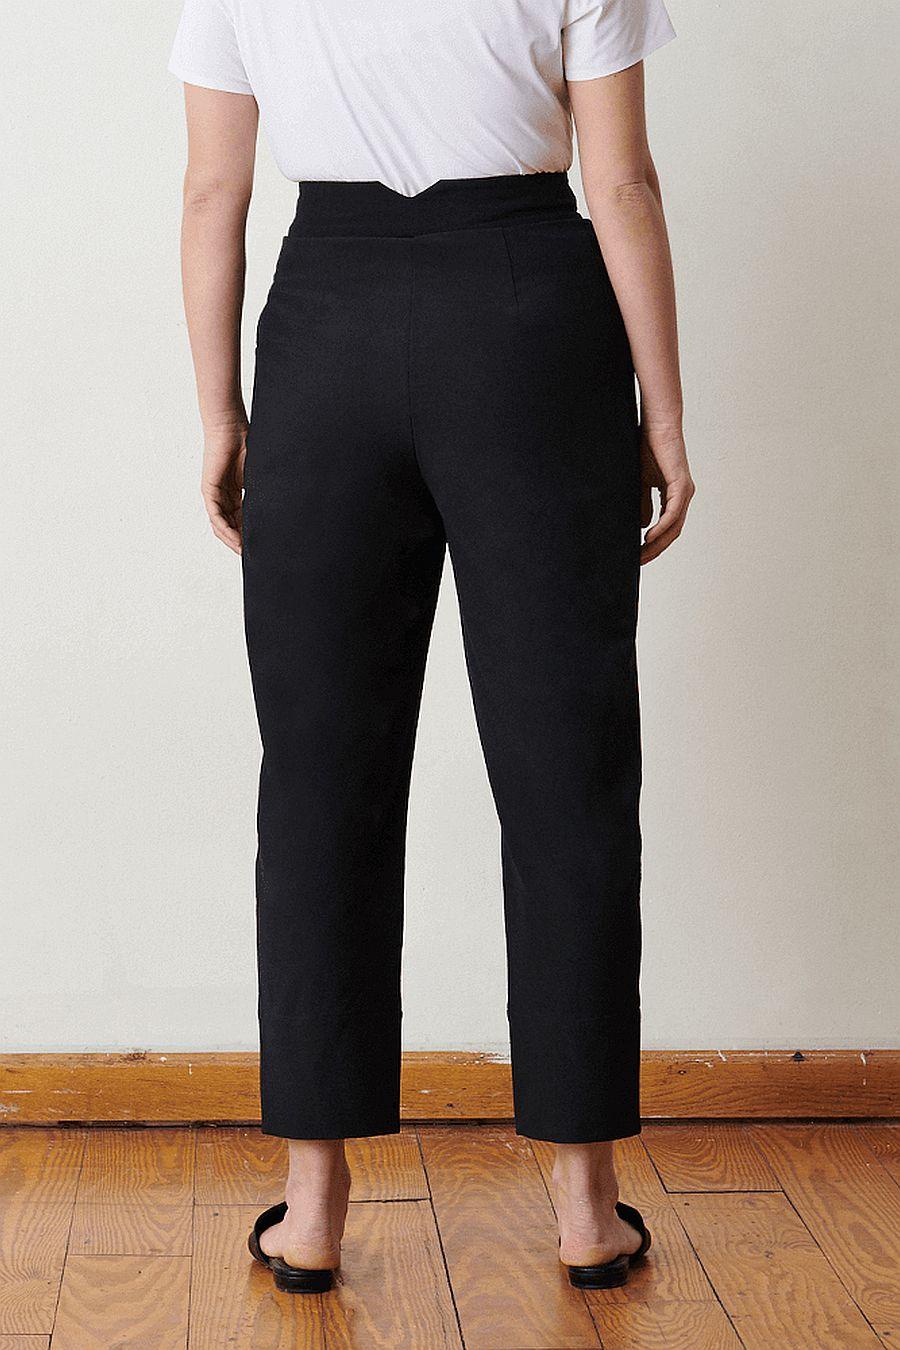 Aday Portfolio Pant - Black